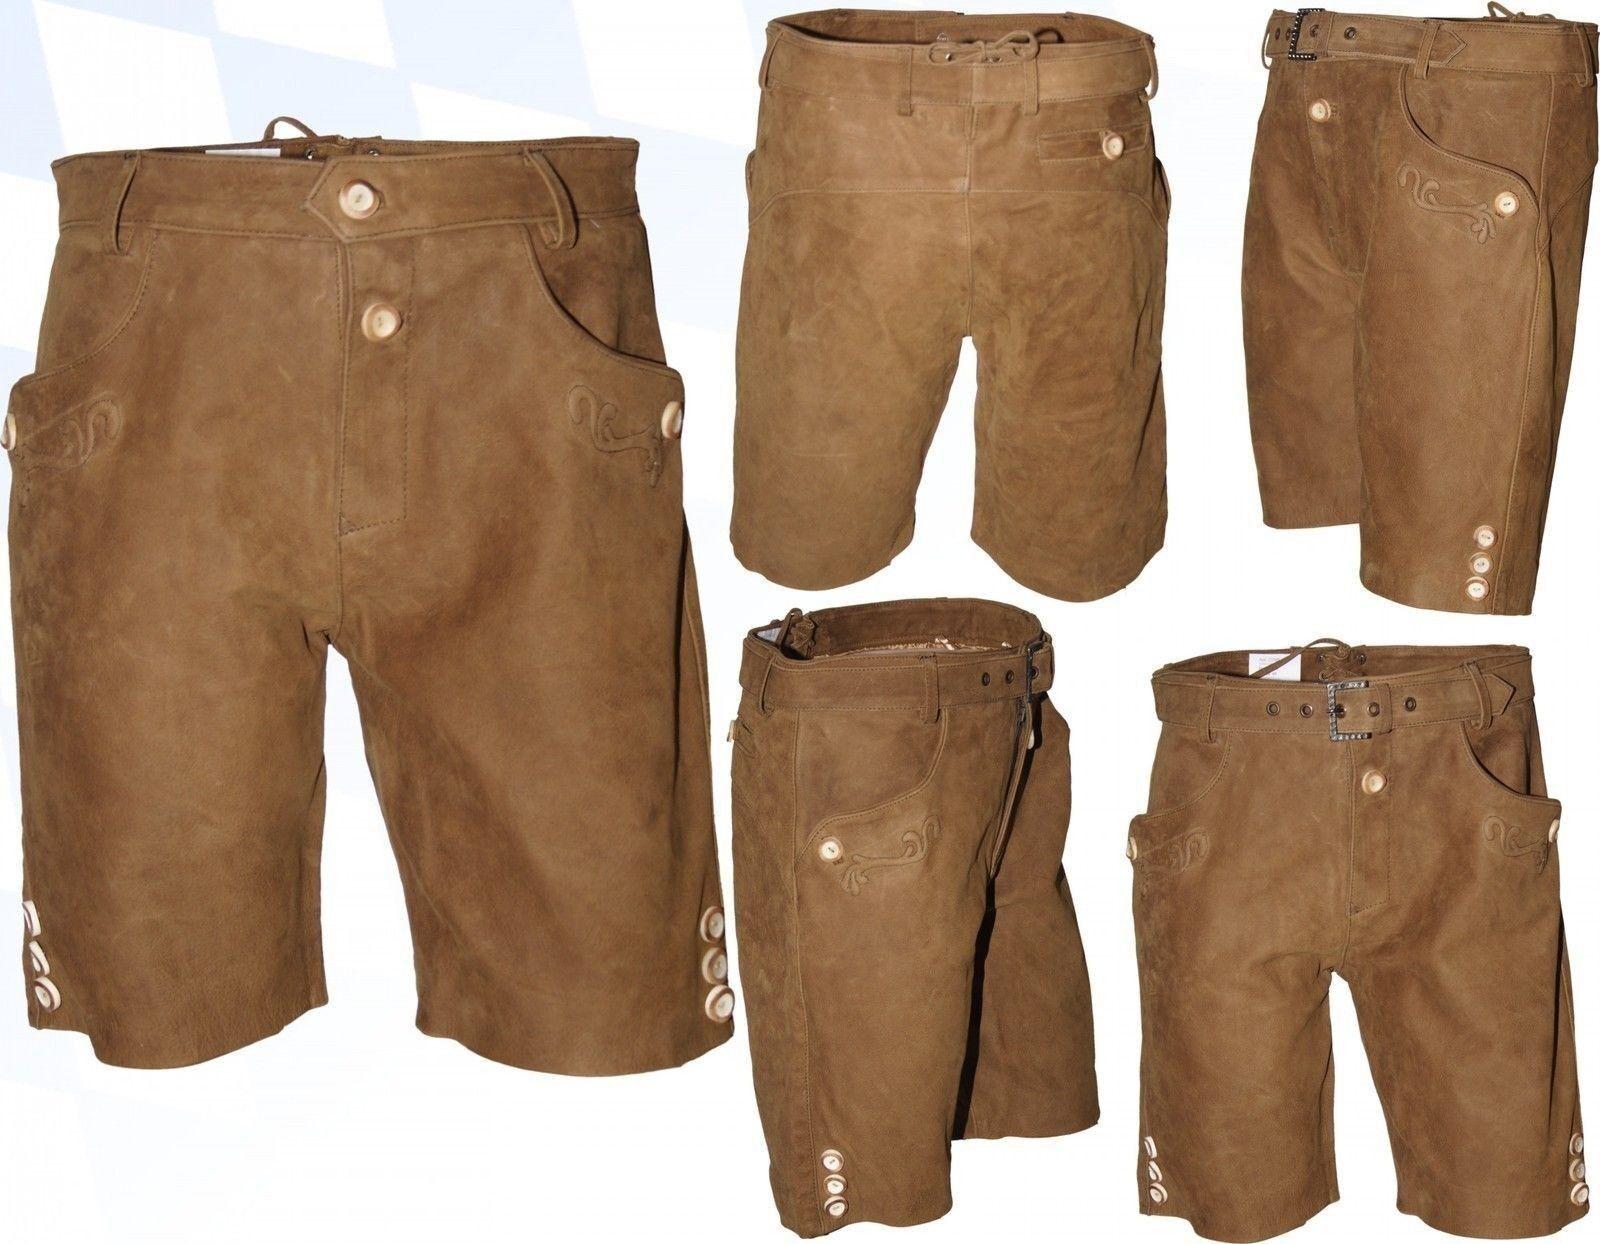 Breve Breve Breve deportiva Lederhose cuero Trachten pantalones bordado plattlerhose a78d29